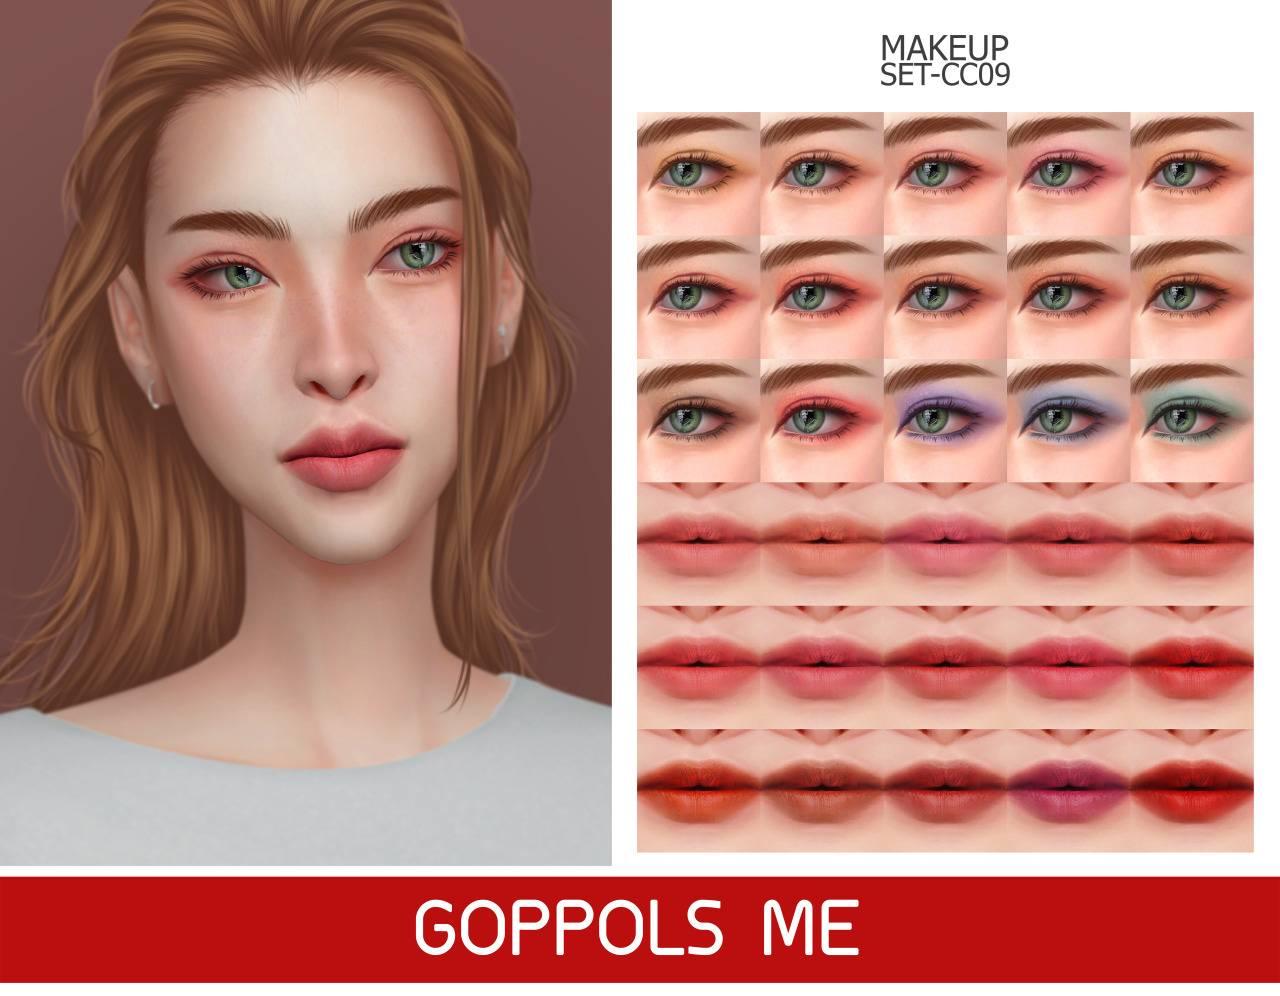 Набор косметики - MAKEUP SET CC09